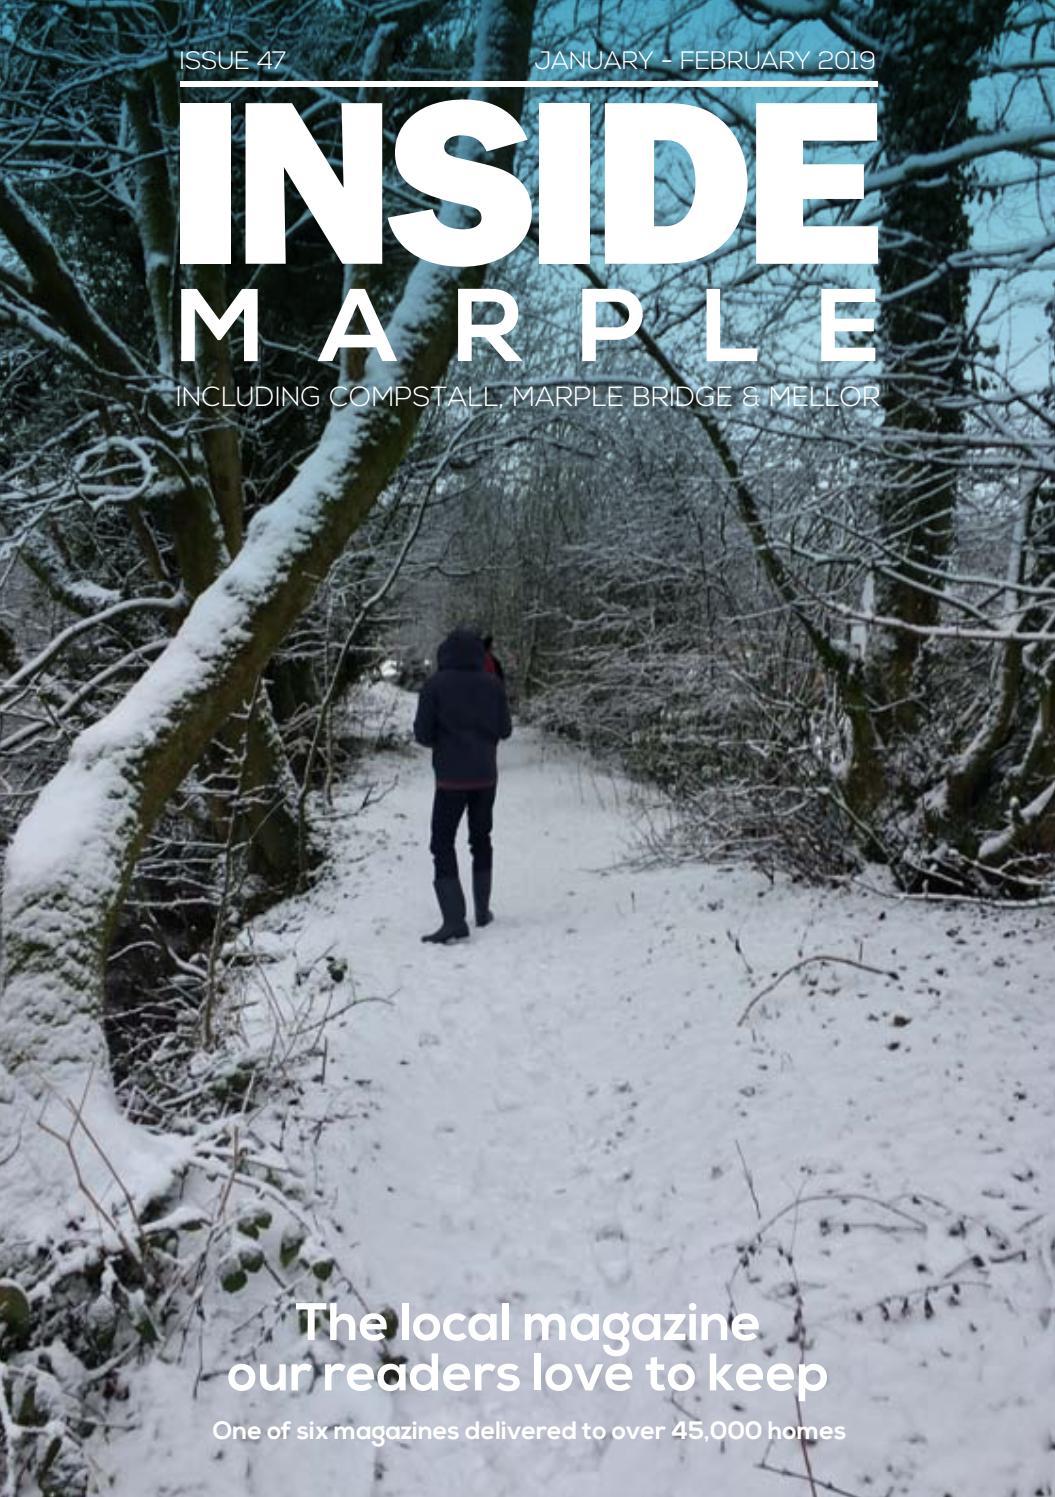 INSIDE Marple Issue 47 by INSIDE MAGAZINES - issuu